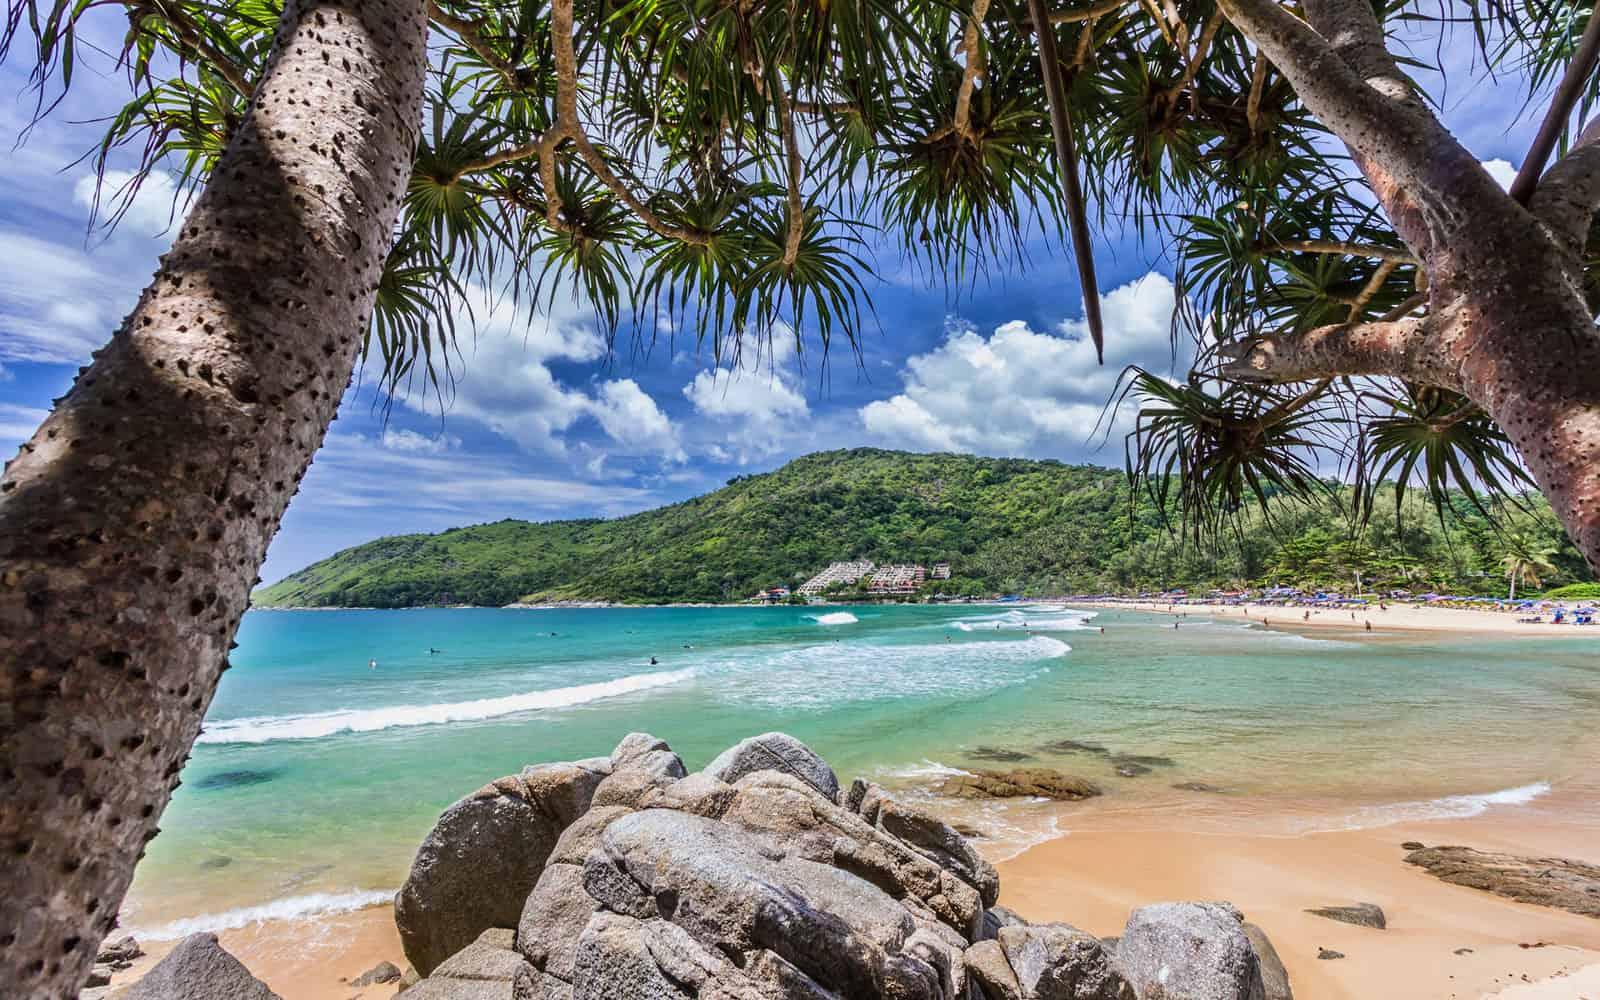 Nai-Harn Beach